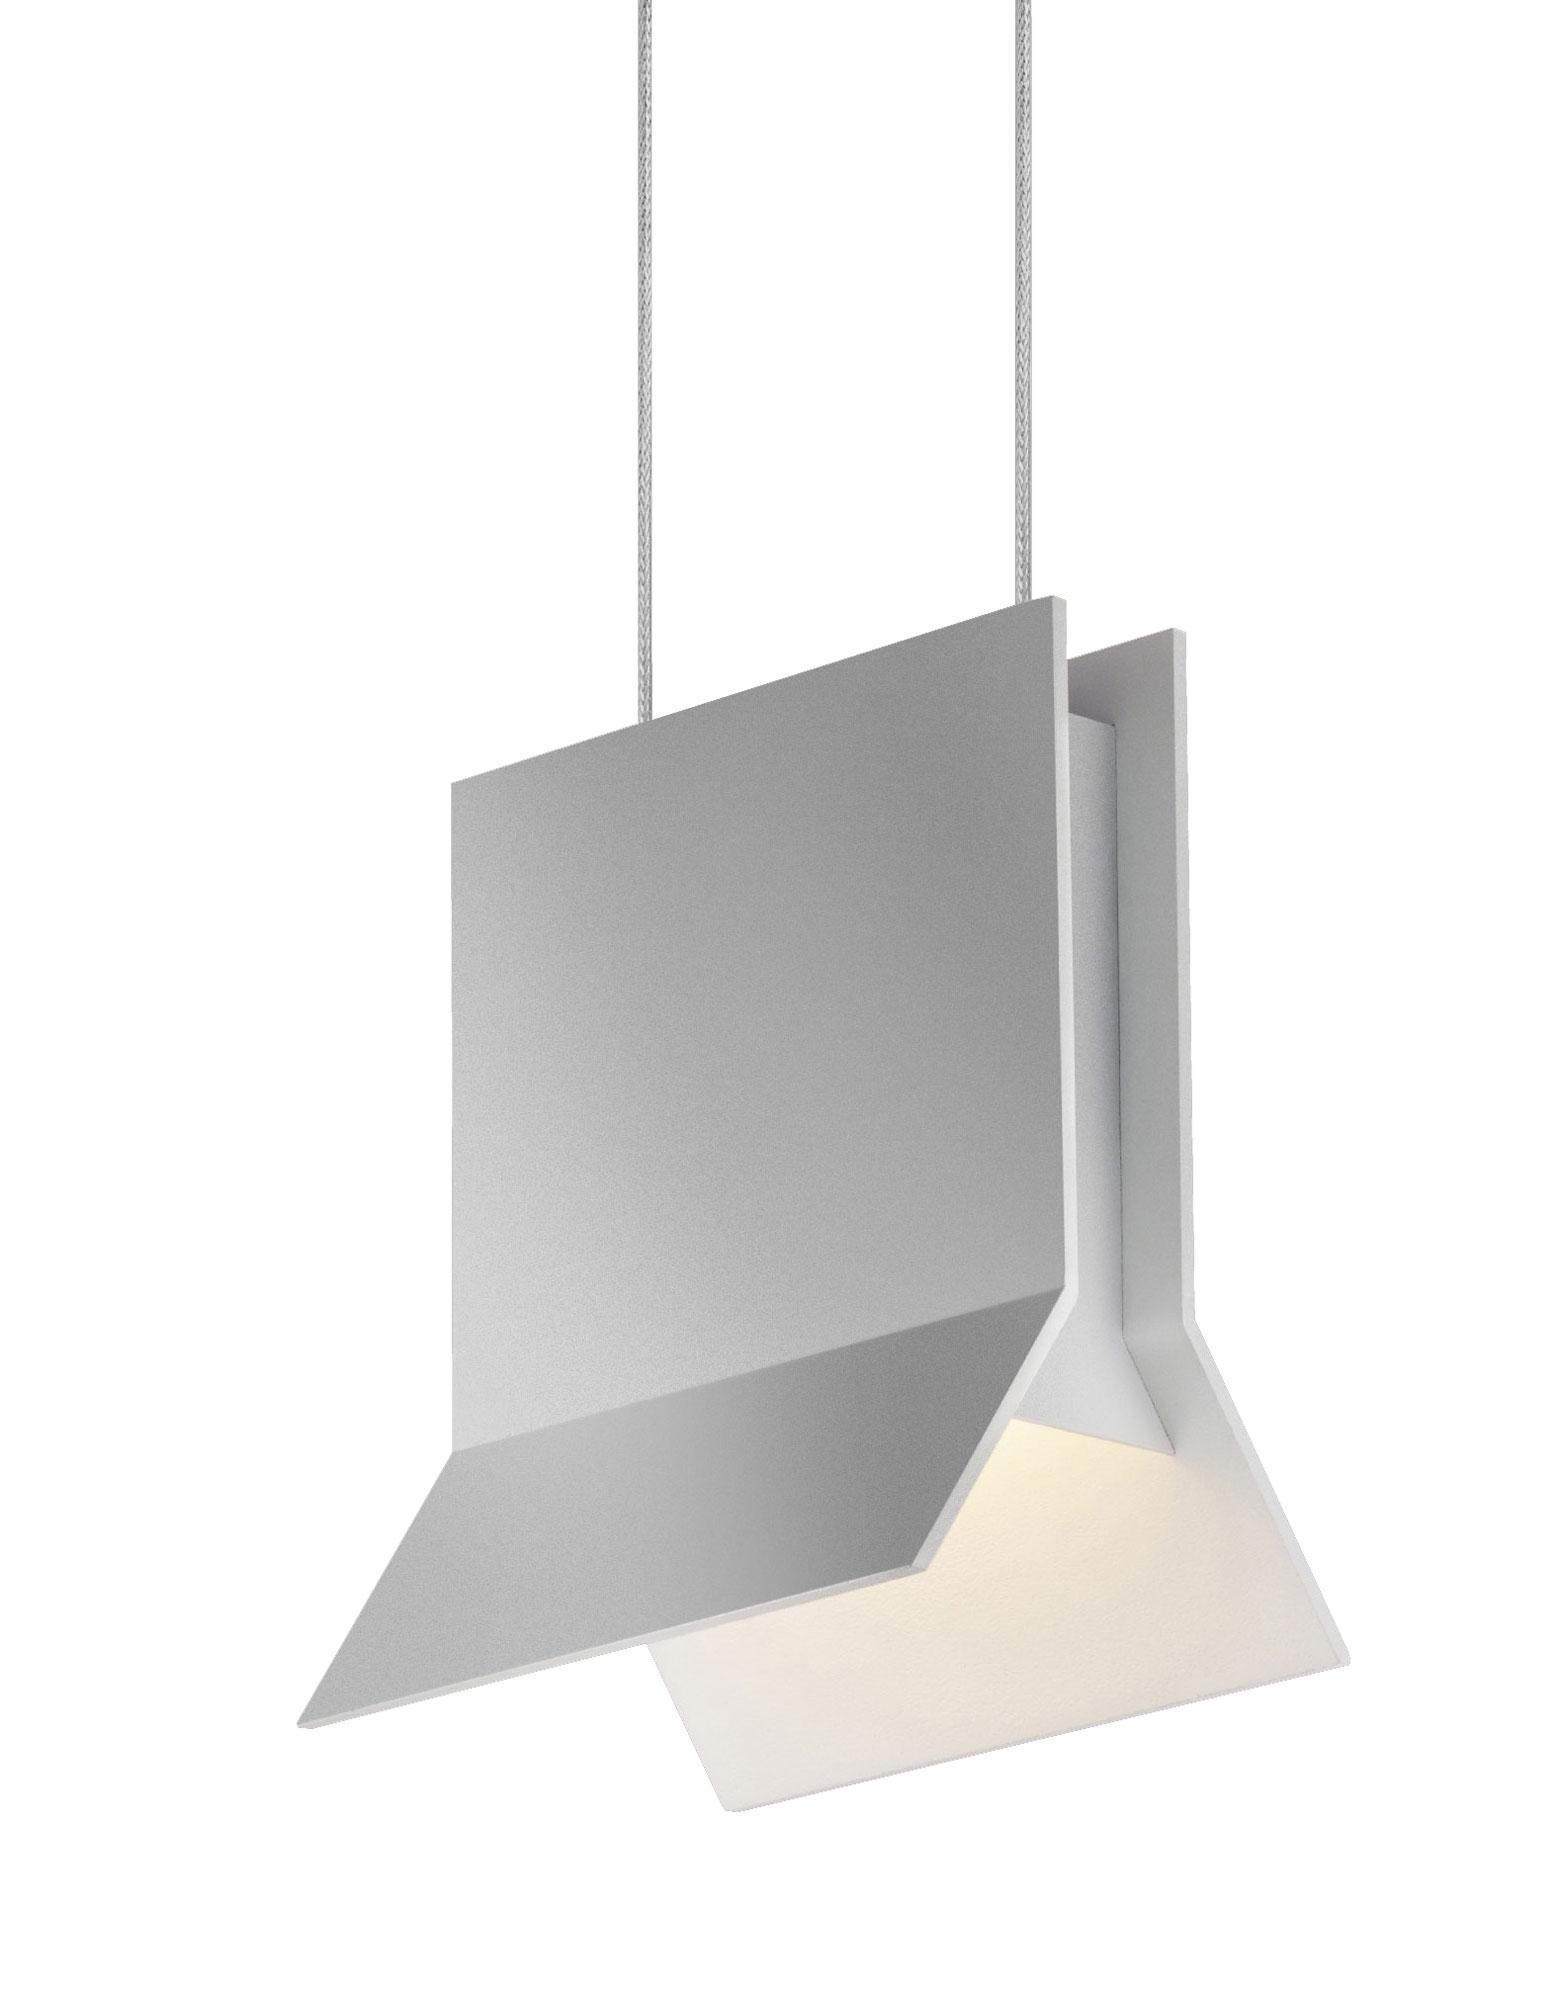 Superb Download Image · Lambda Pendant By SONNEMAN   A Way Of Light ... Home Design Ideas